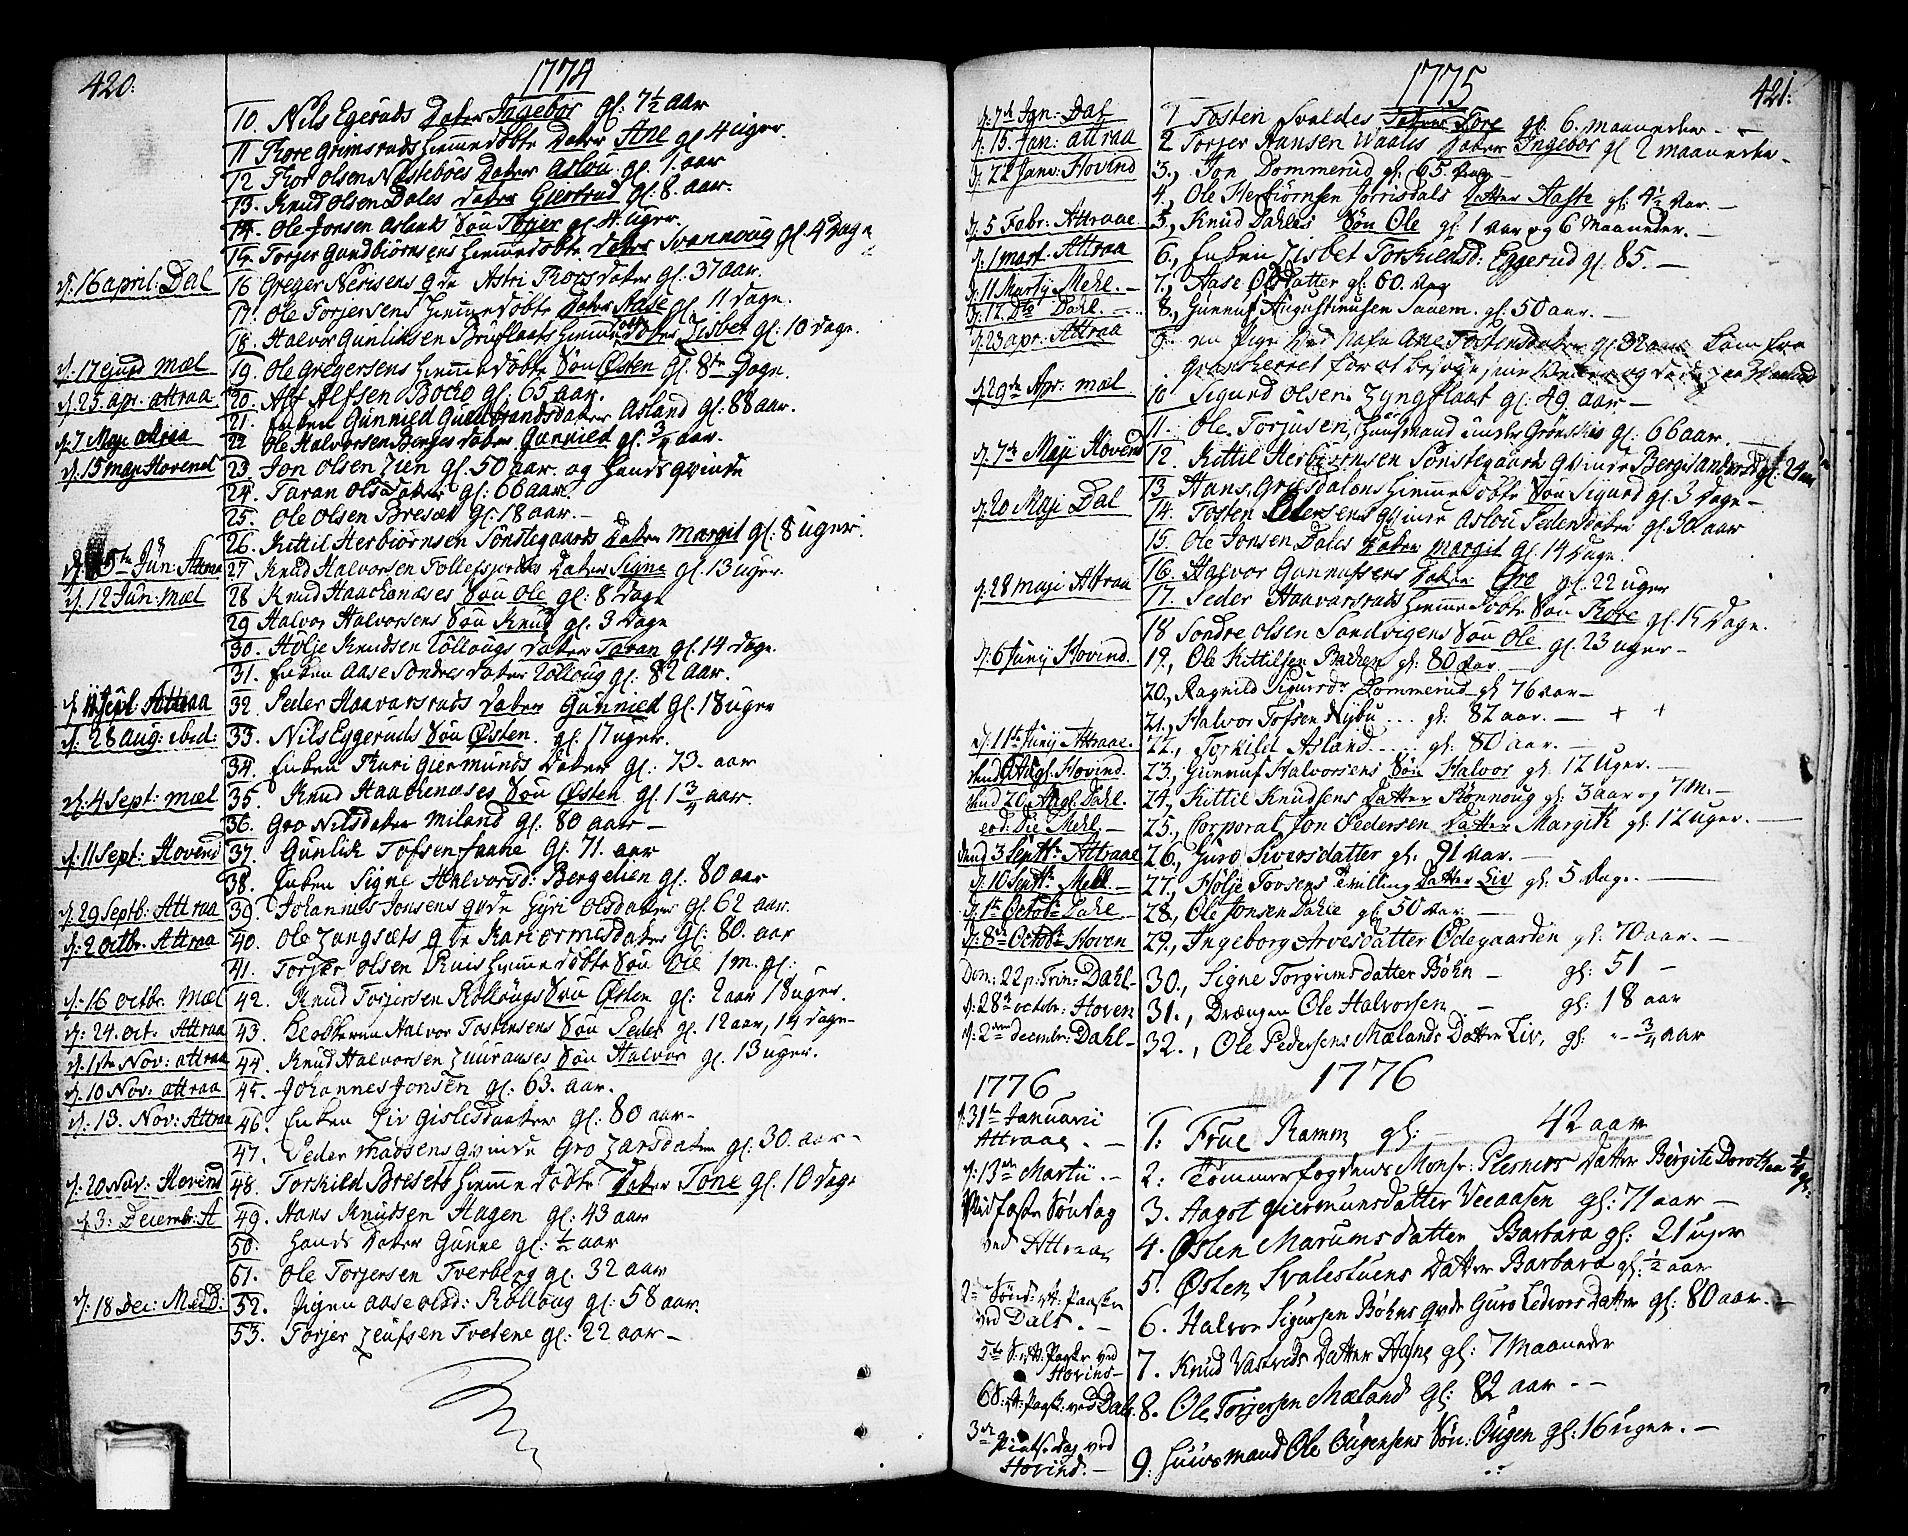 SAKO, Tinn kirkebøker, F/Fa/L0002: Ministerialbok nr. I 2, 1757-1810, s. 420-421